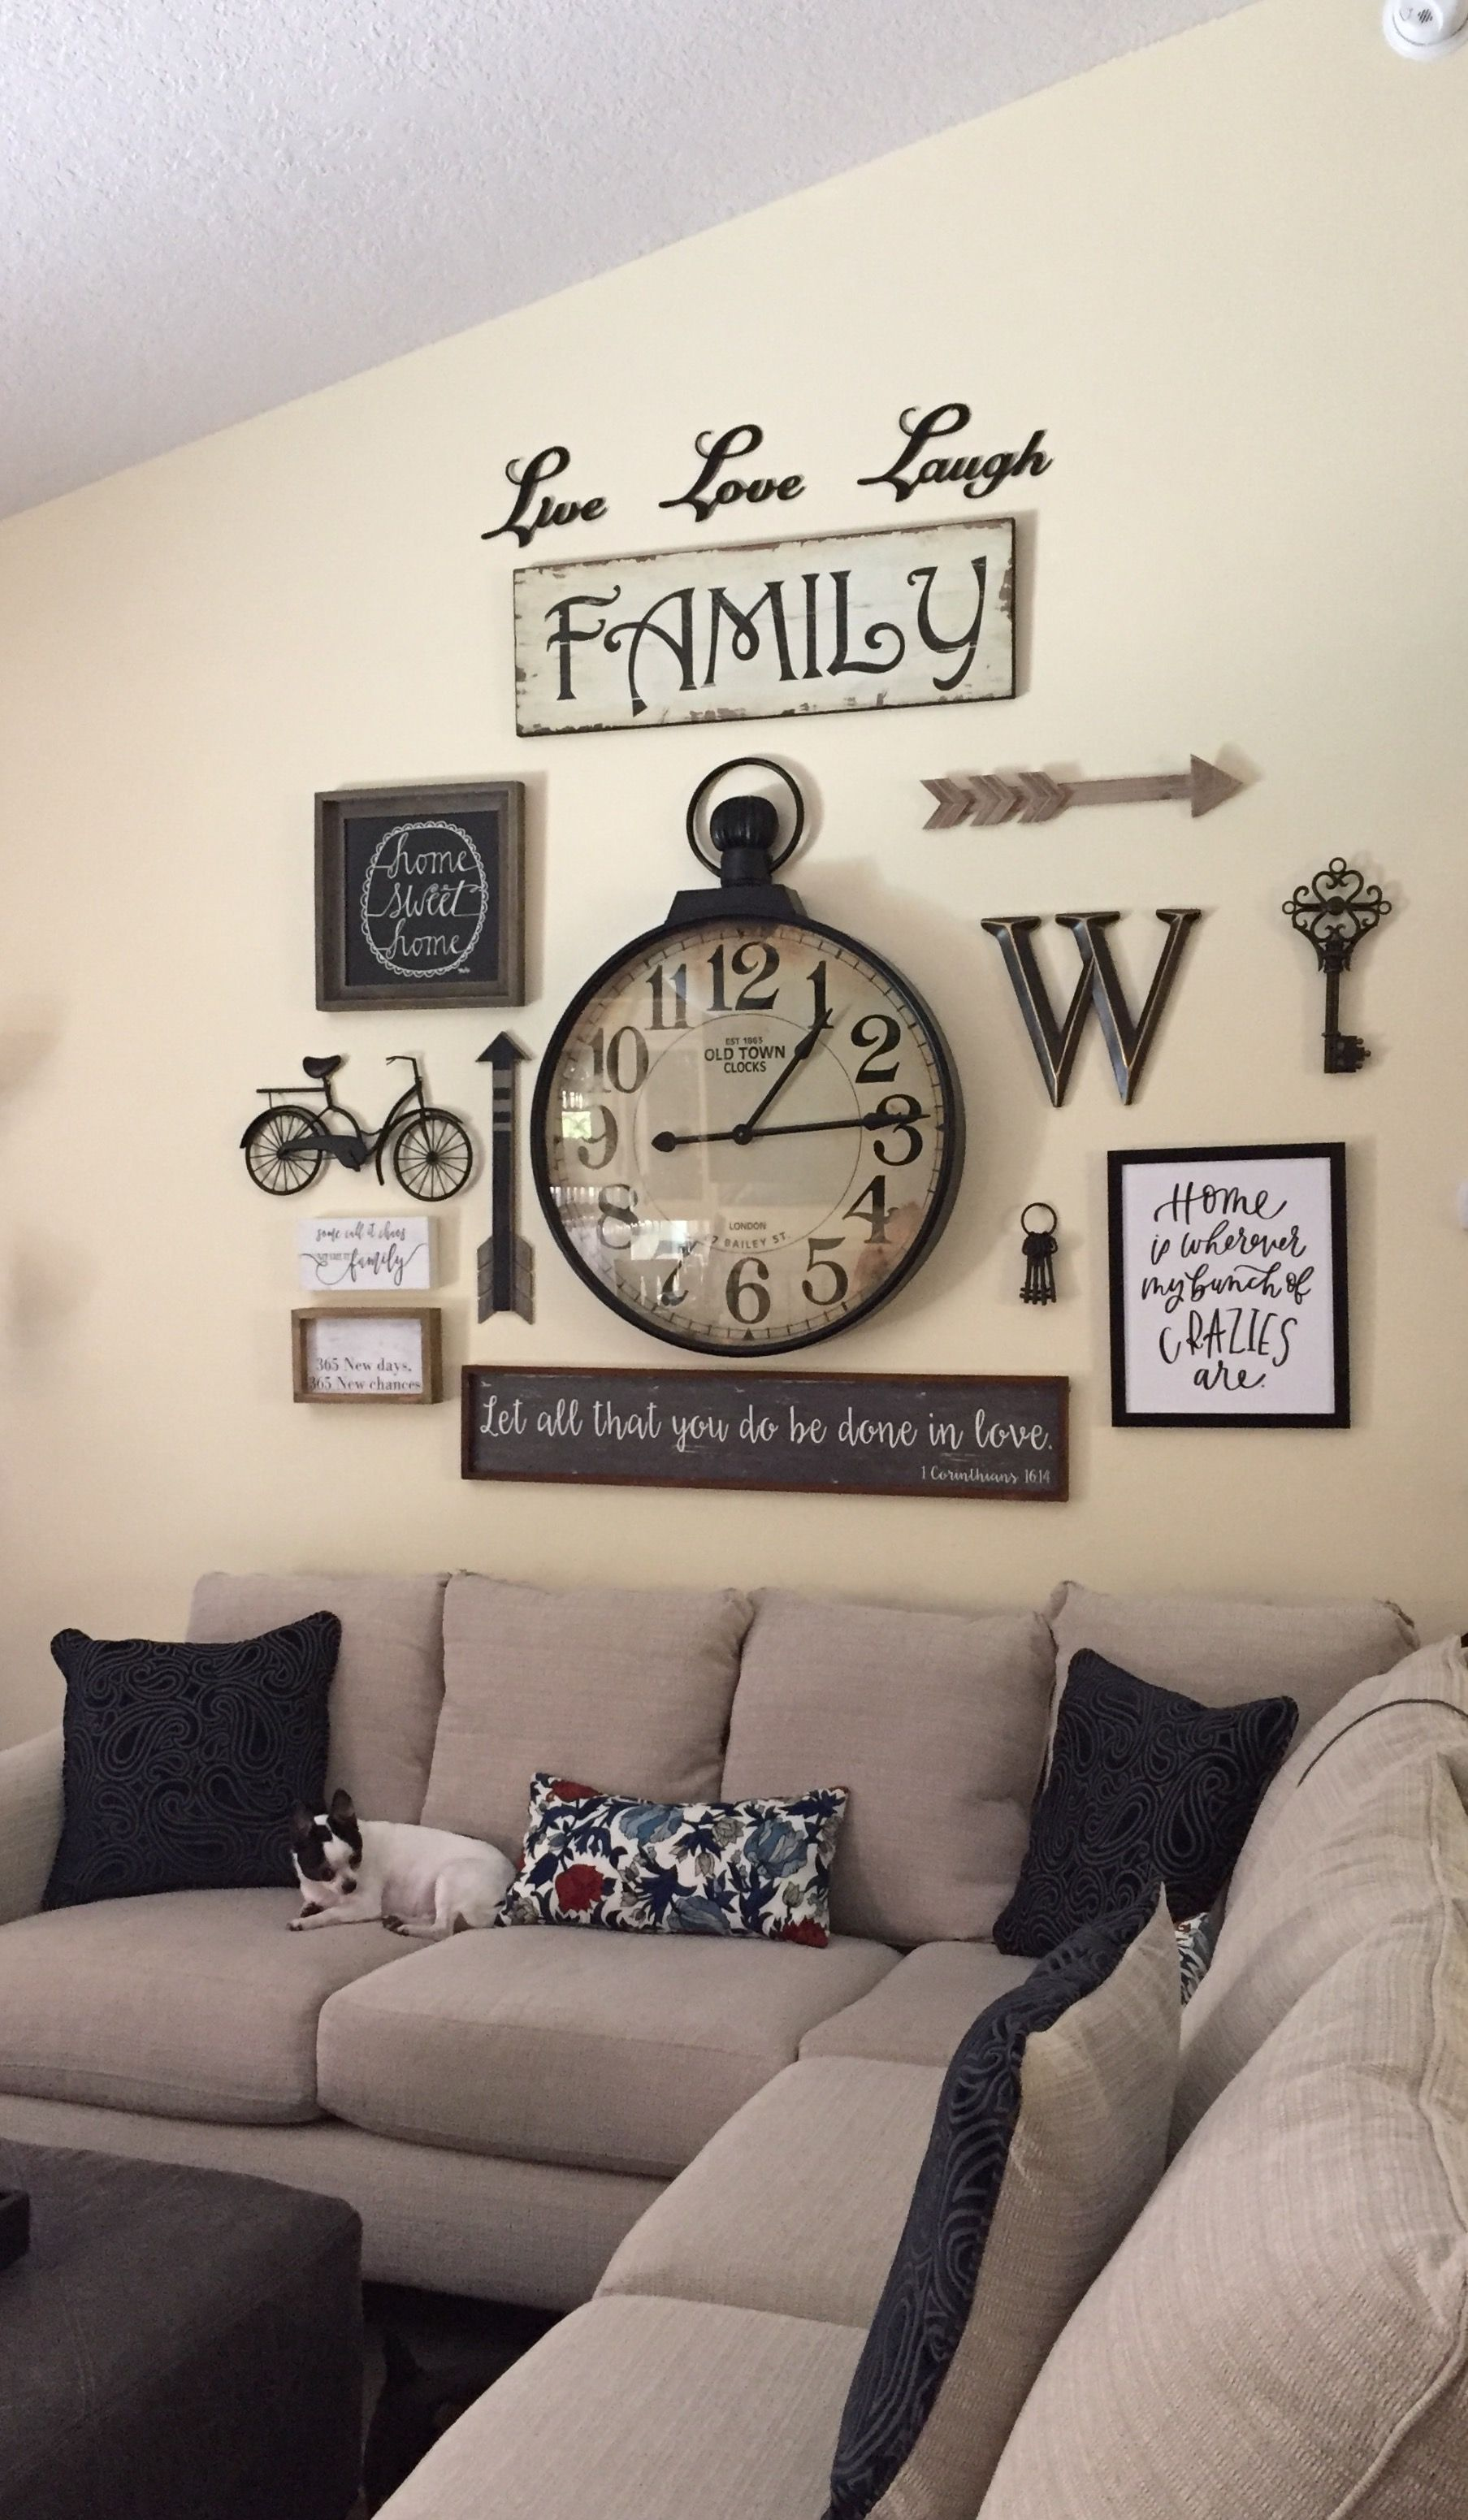 18 Best Modern Rustic Farmhouse Wall Decor Ideas You Ll Love With Images Farmhouse Wall Decor Rustic Wall Decor Decor